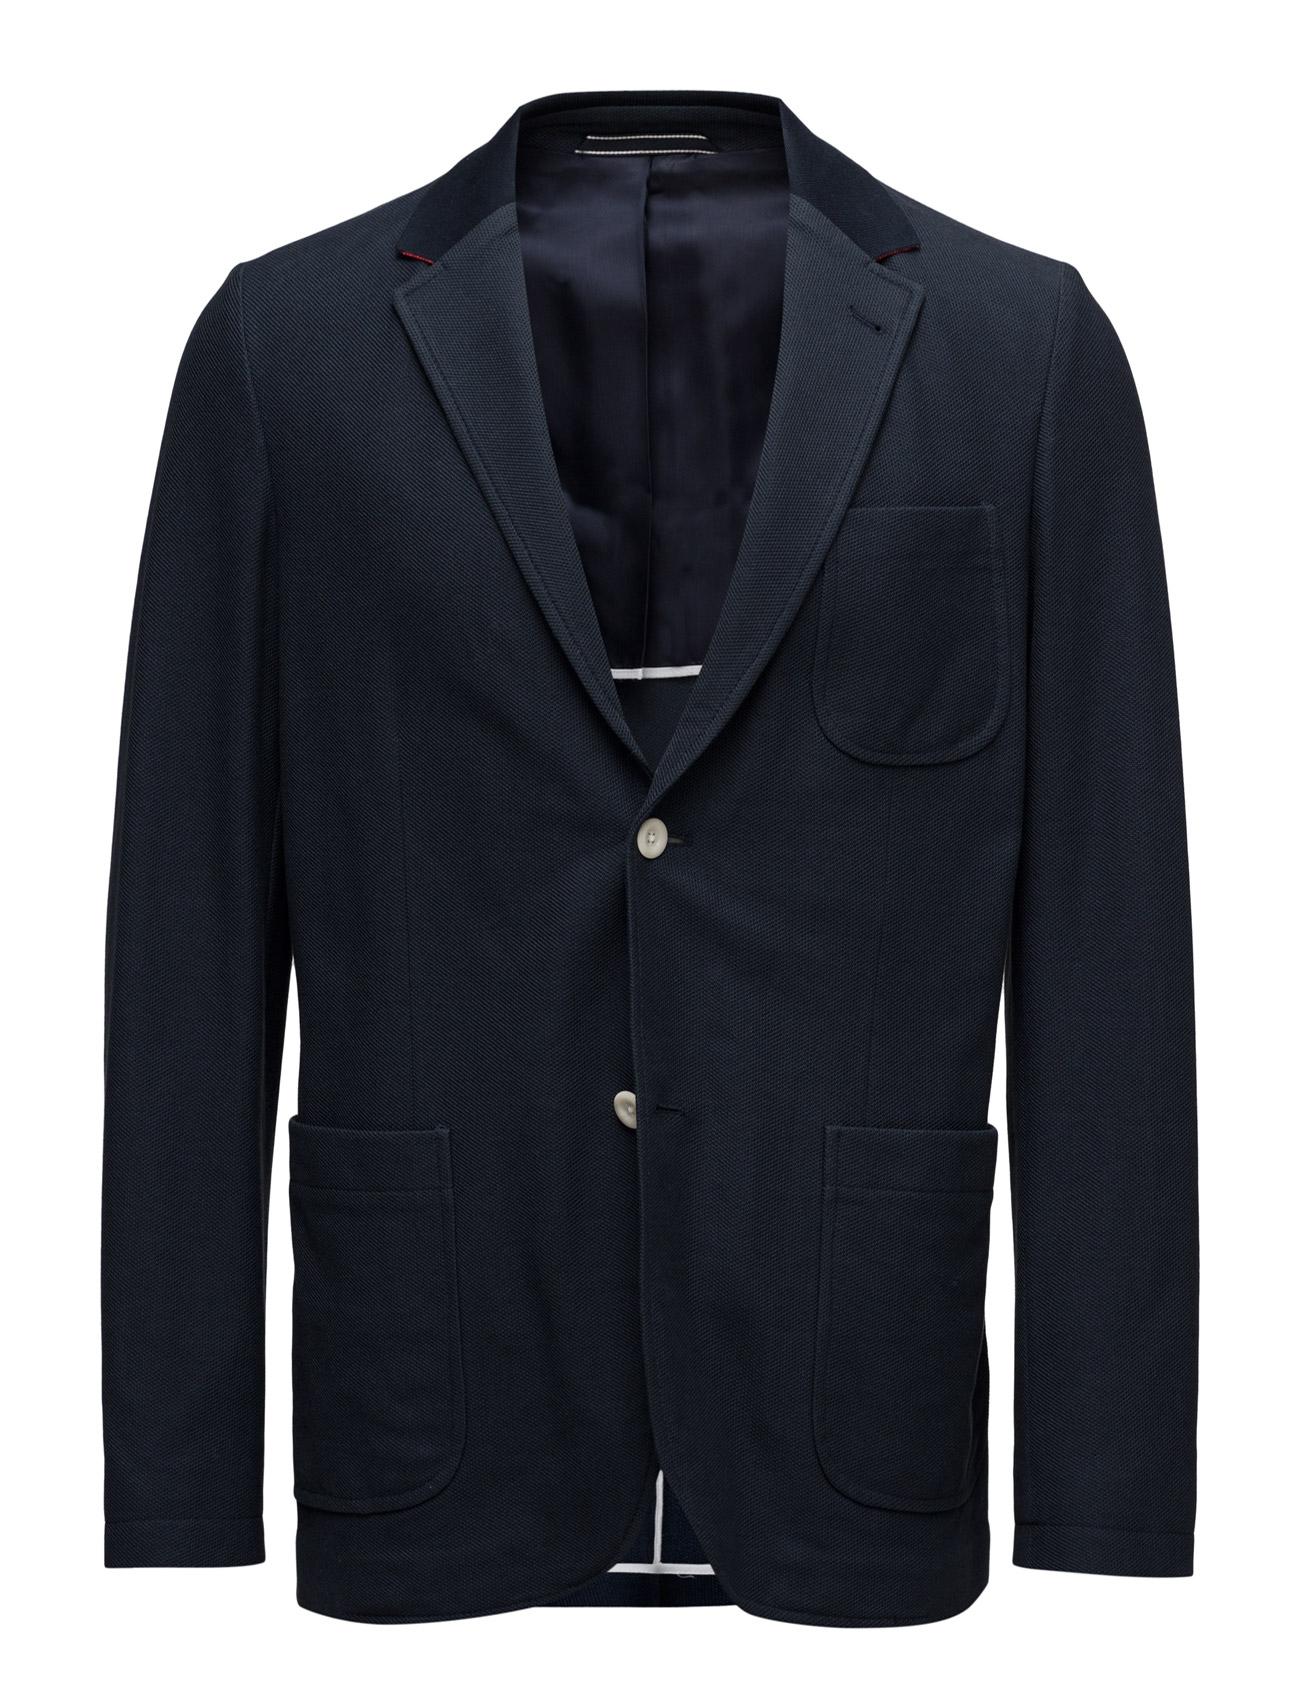 O.P. Polo Collar Blazer 2b3ppc GANT Jakkesæt & Blazee til Mænd i Navy blå